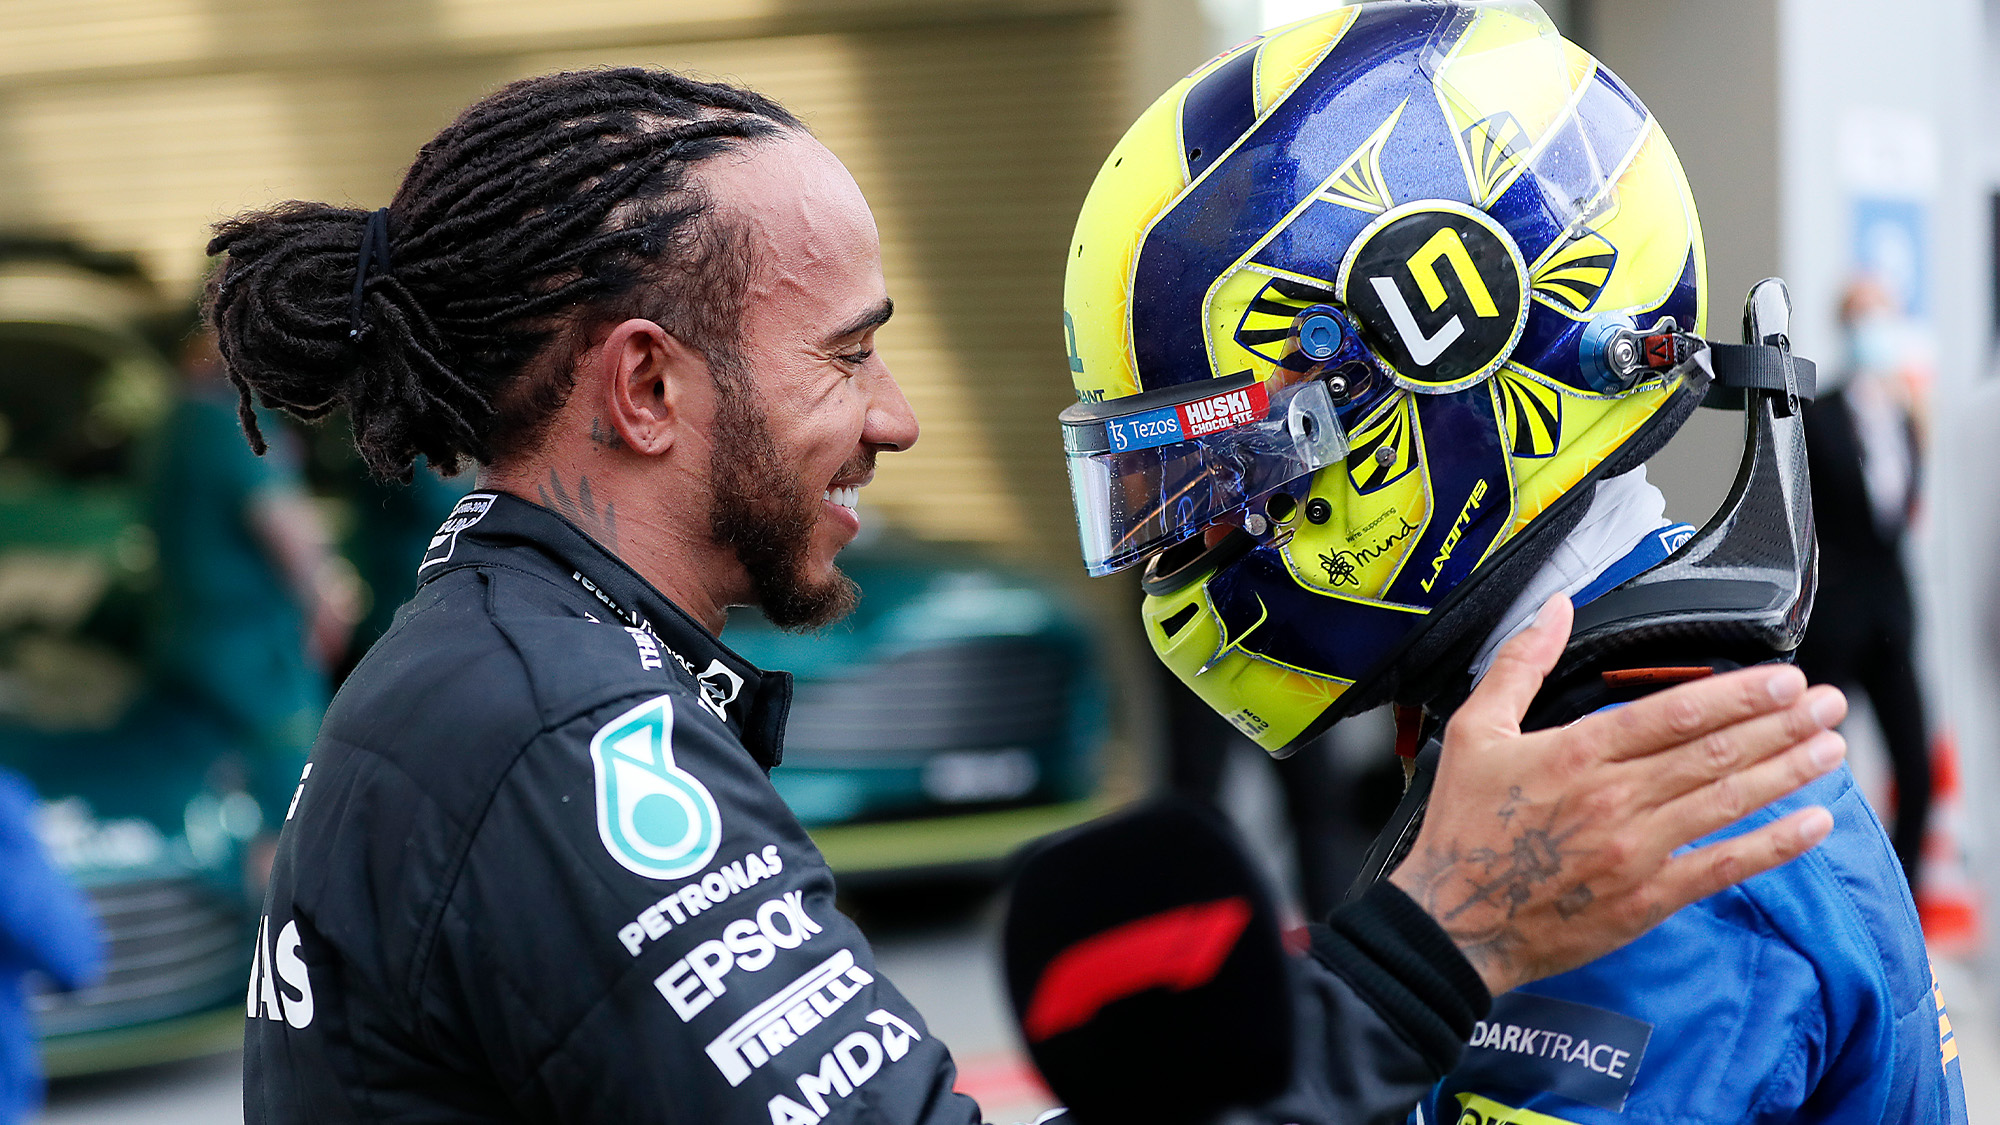 Lewis Hamilton talks to Lando Norris after winning the 2021 Russian Grand Prix